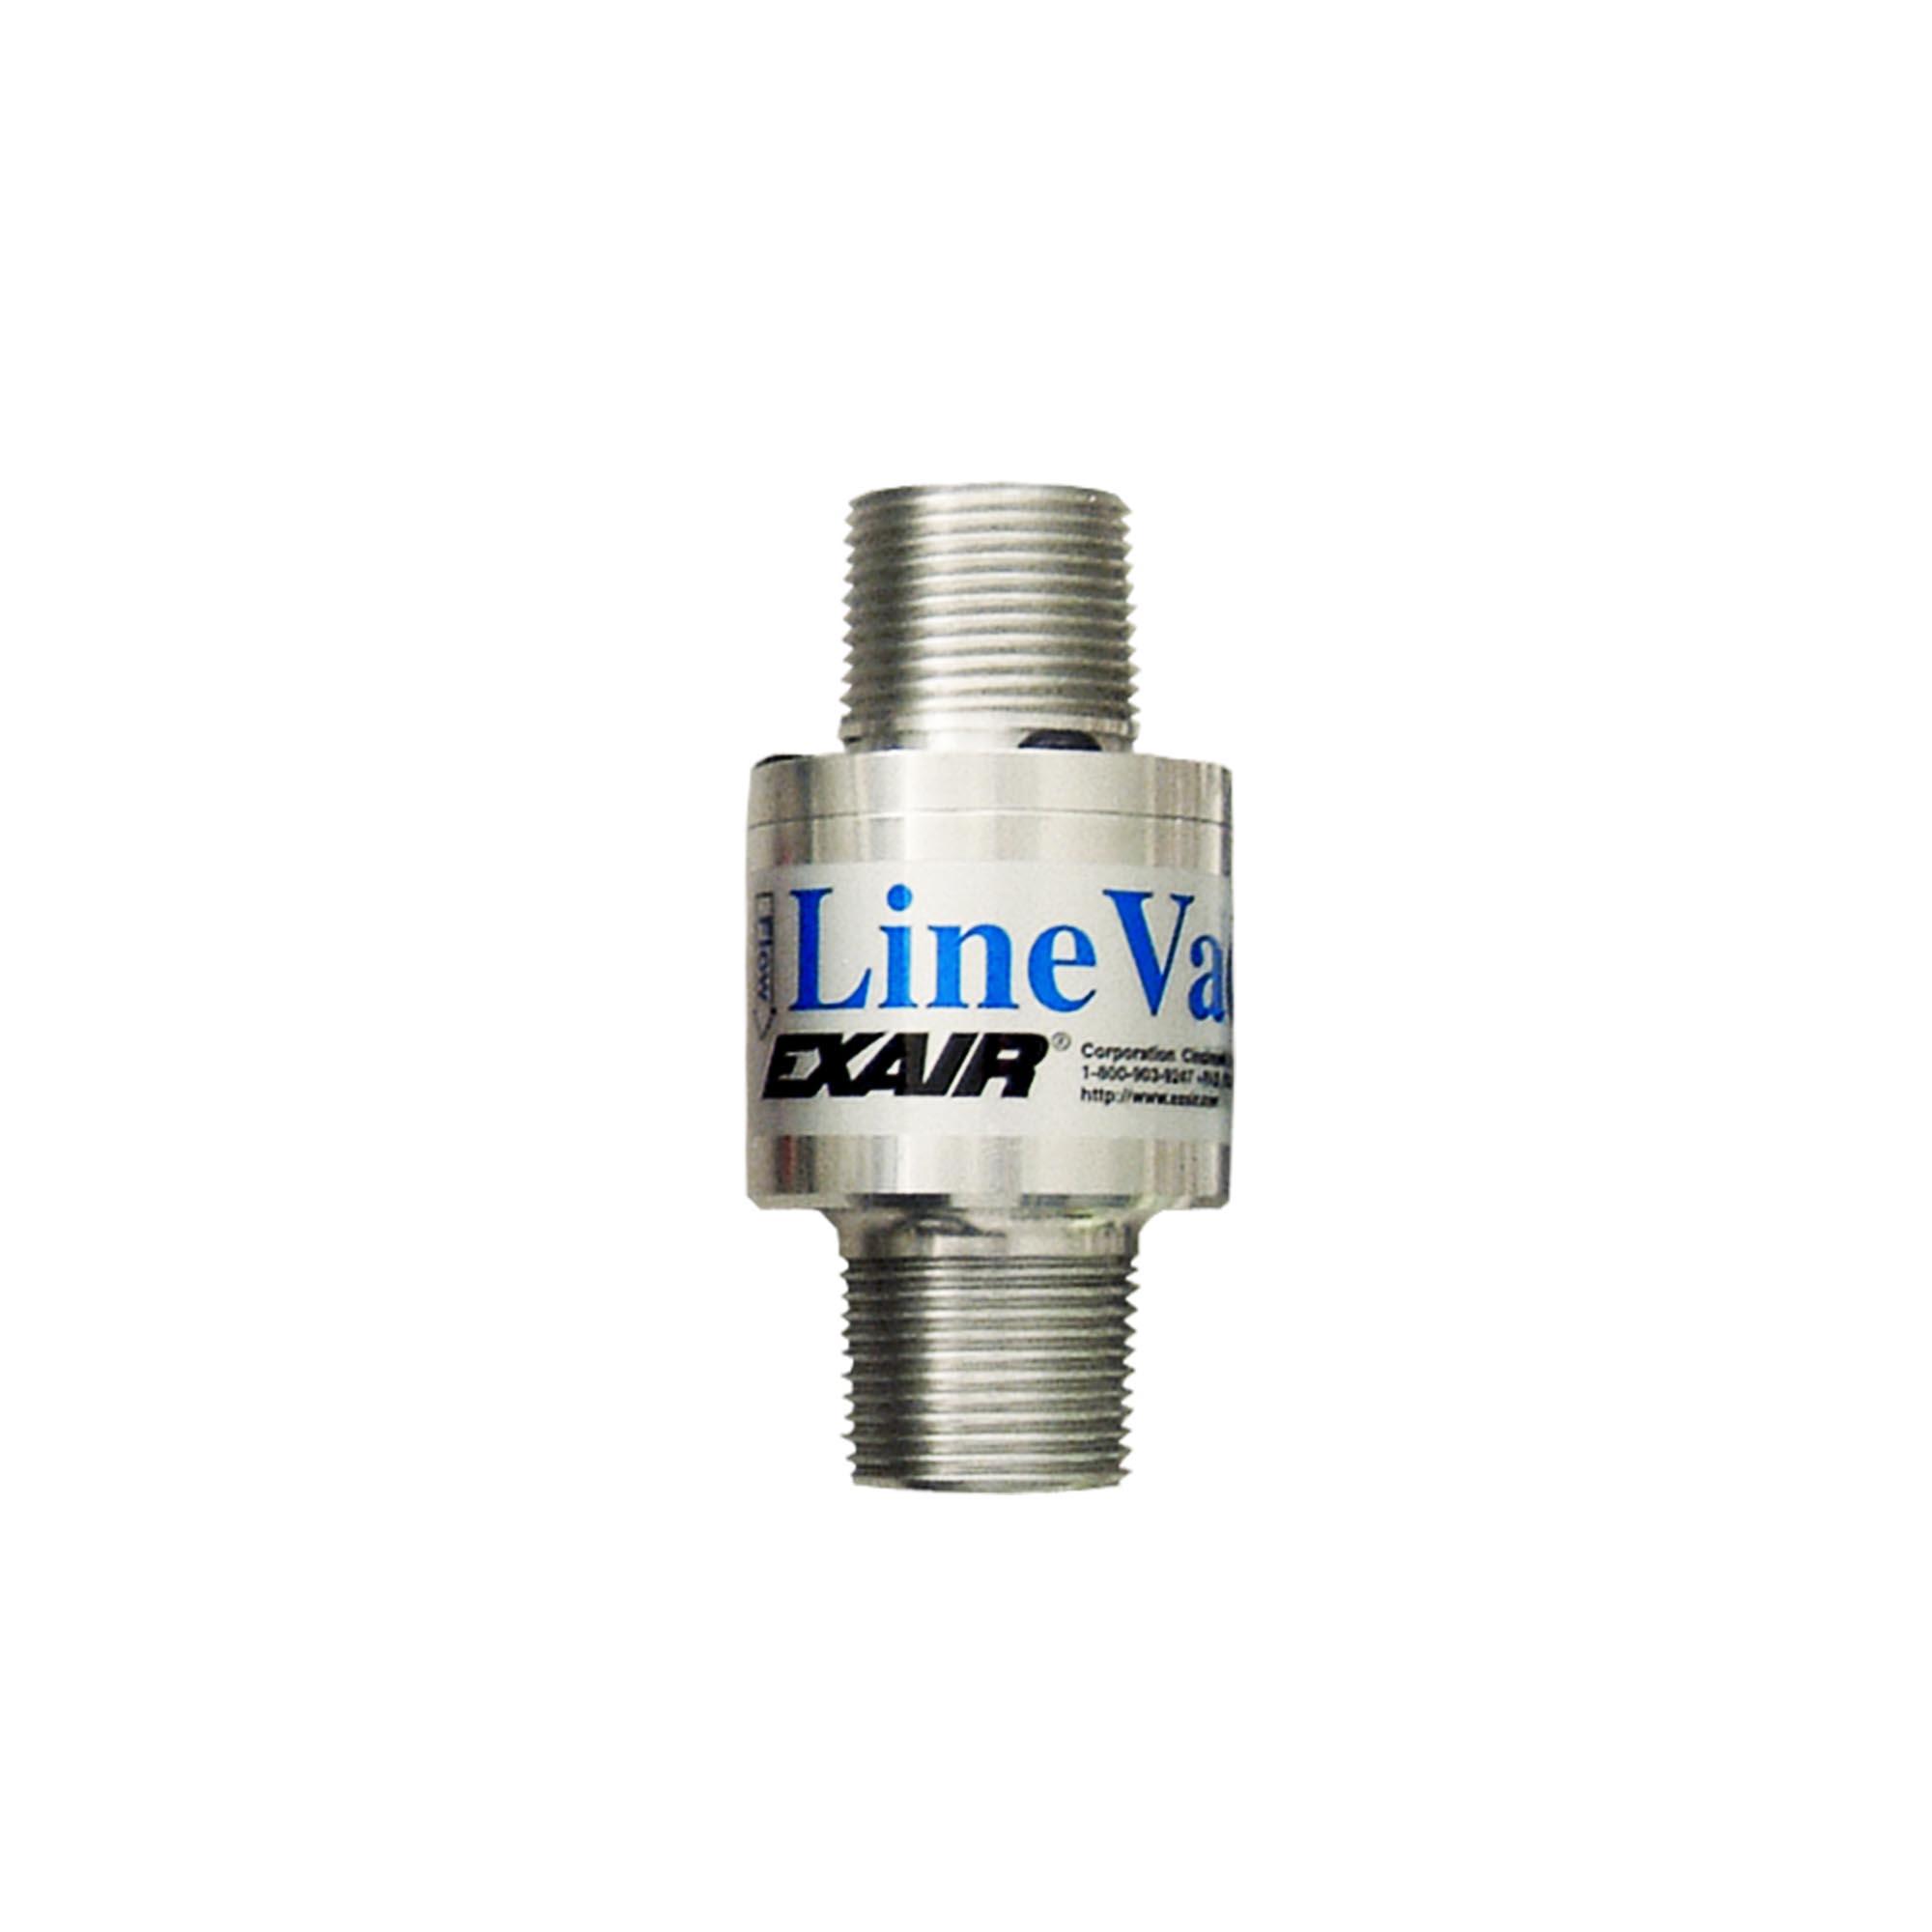 Model 140100 1 NPT Alum. Threaded Line Vac